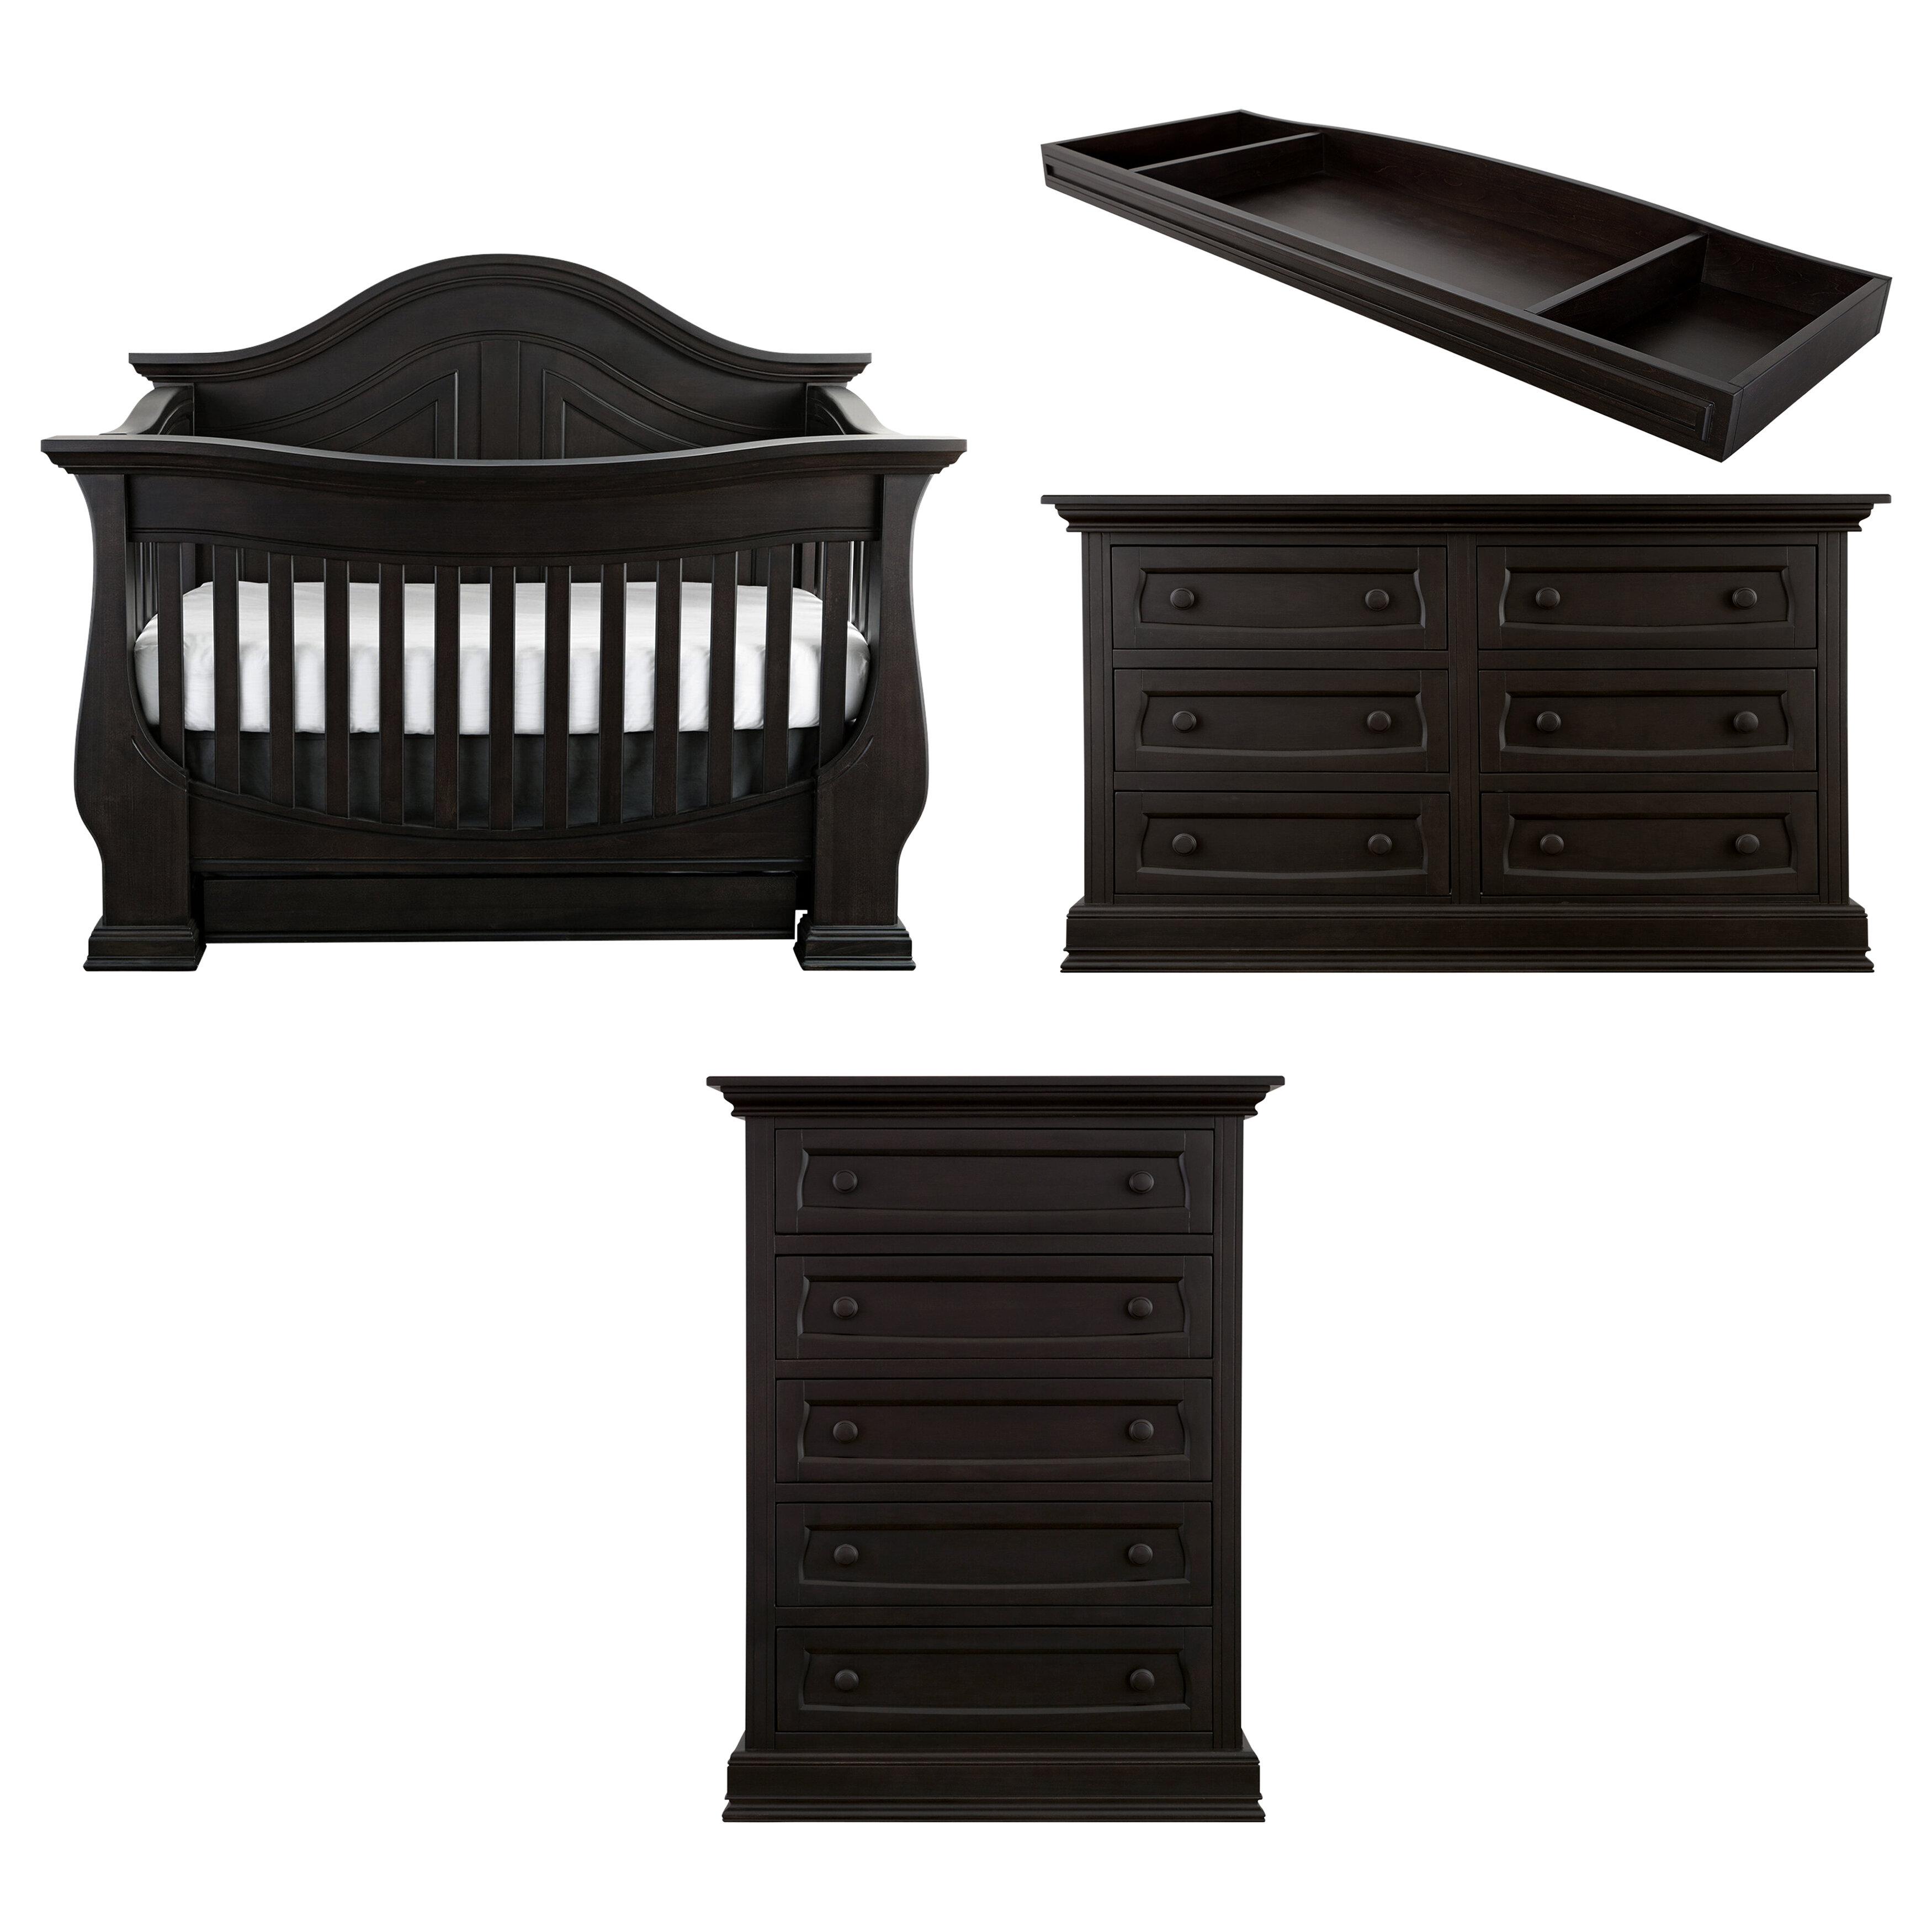 BabyAppleseed Dorchester Convertible Standard Nursery Furniture